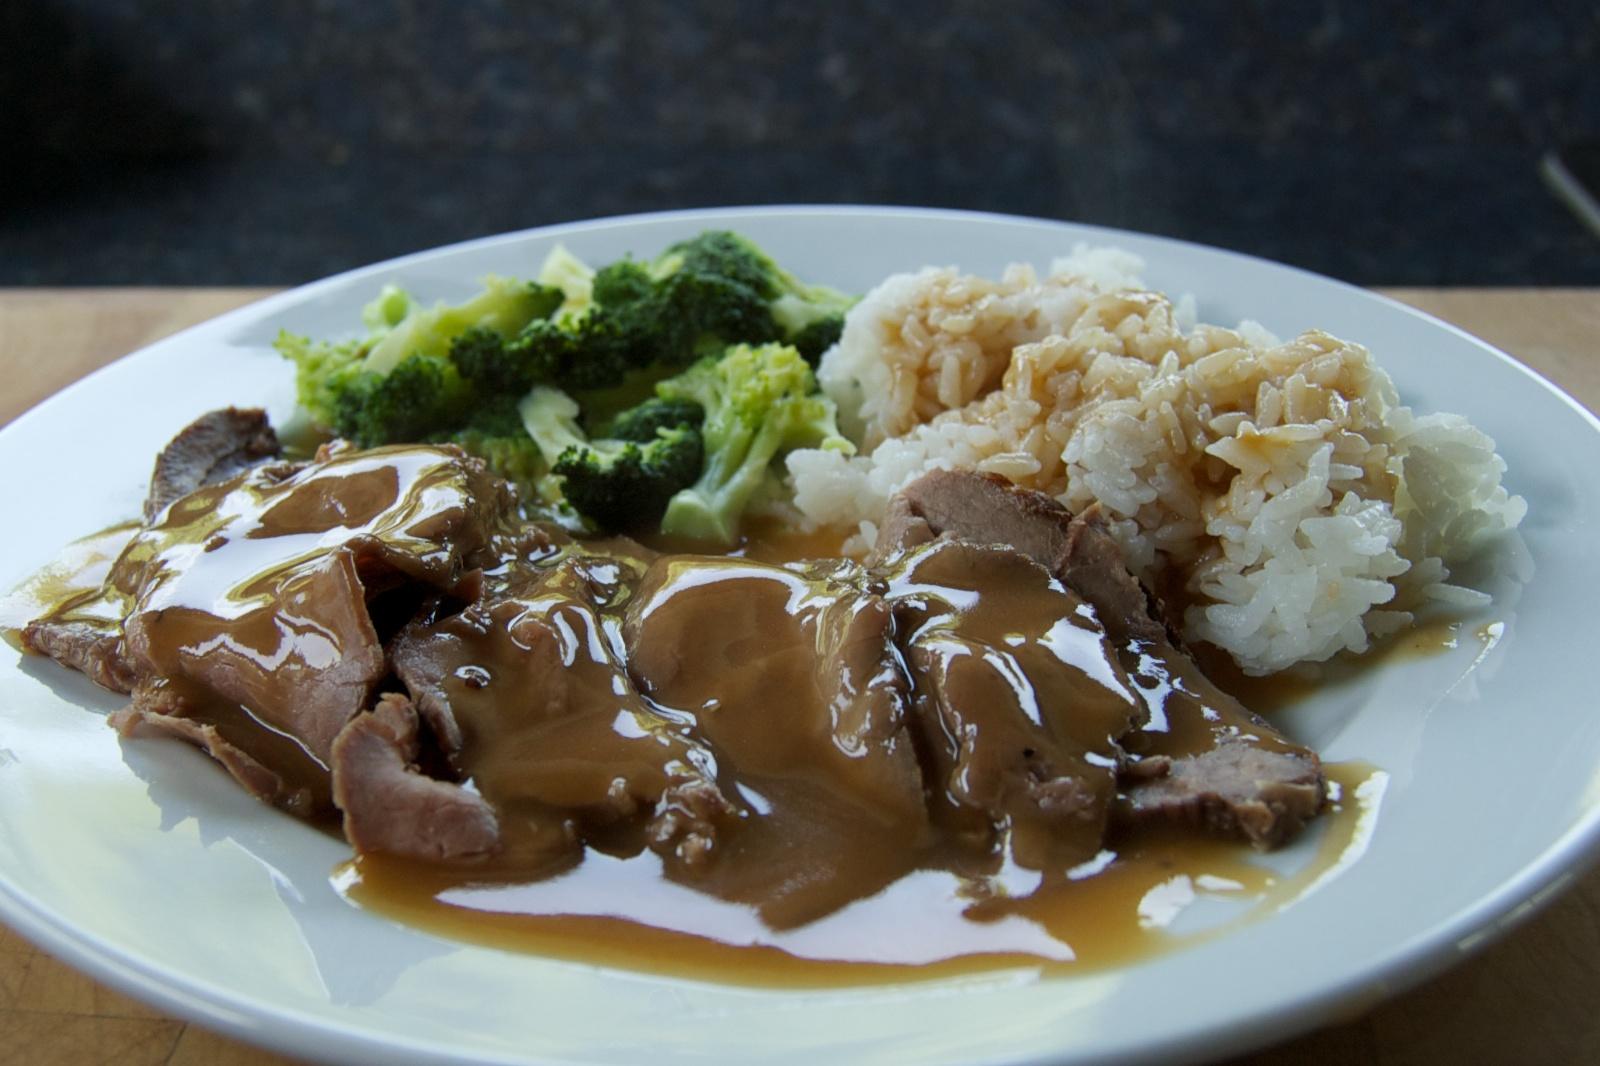 http://blog.rickk.com/food/2011/07/21/ate.2011.07.21.d.jpg